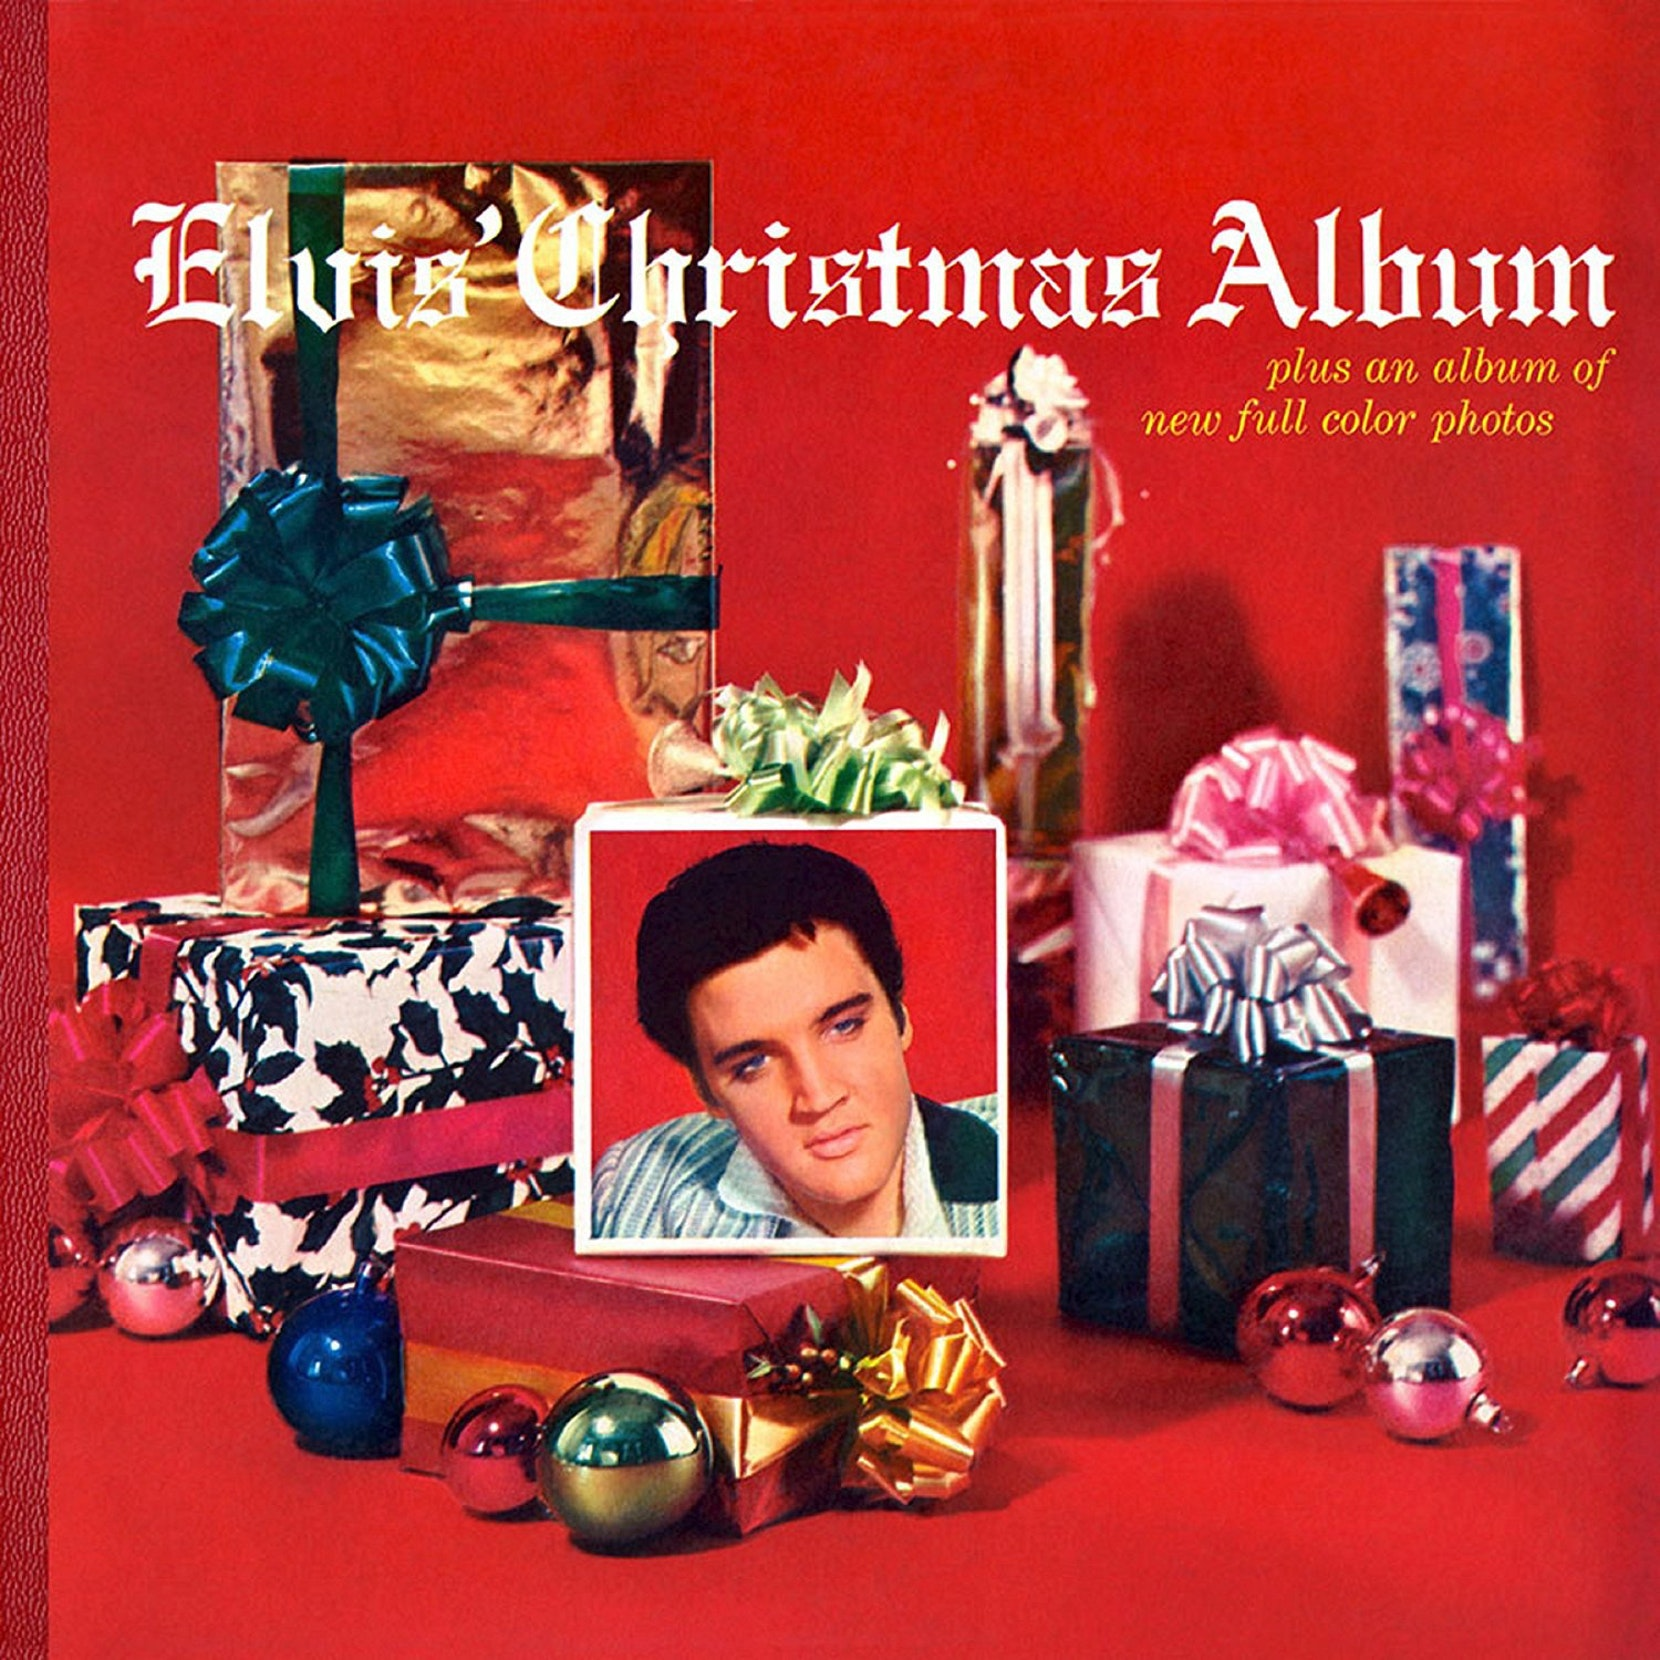 10 Best Christmas Albums to Own on Vinyl — Vinyl Me, Please